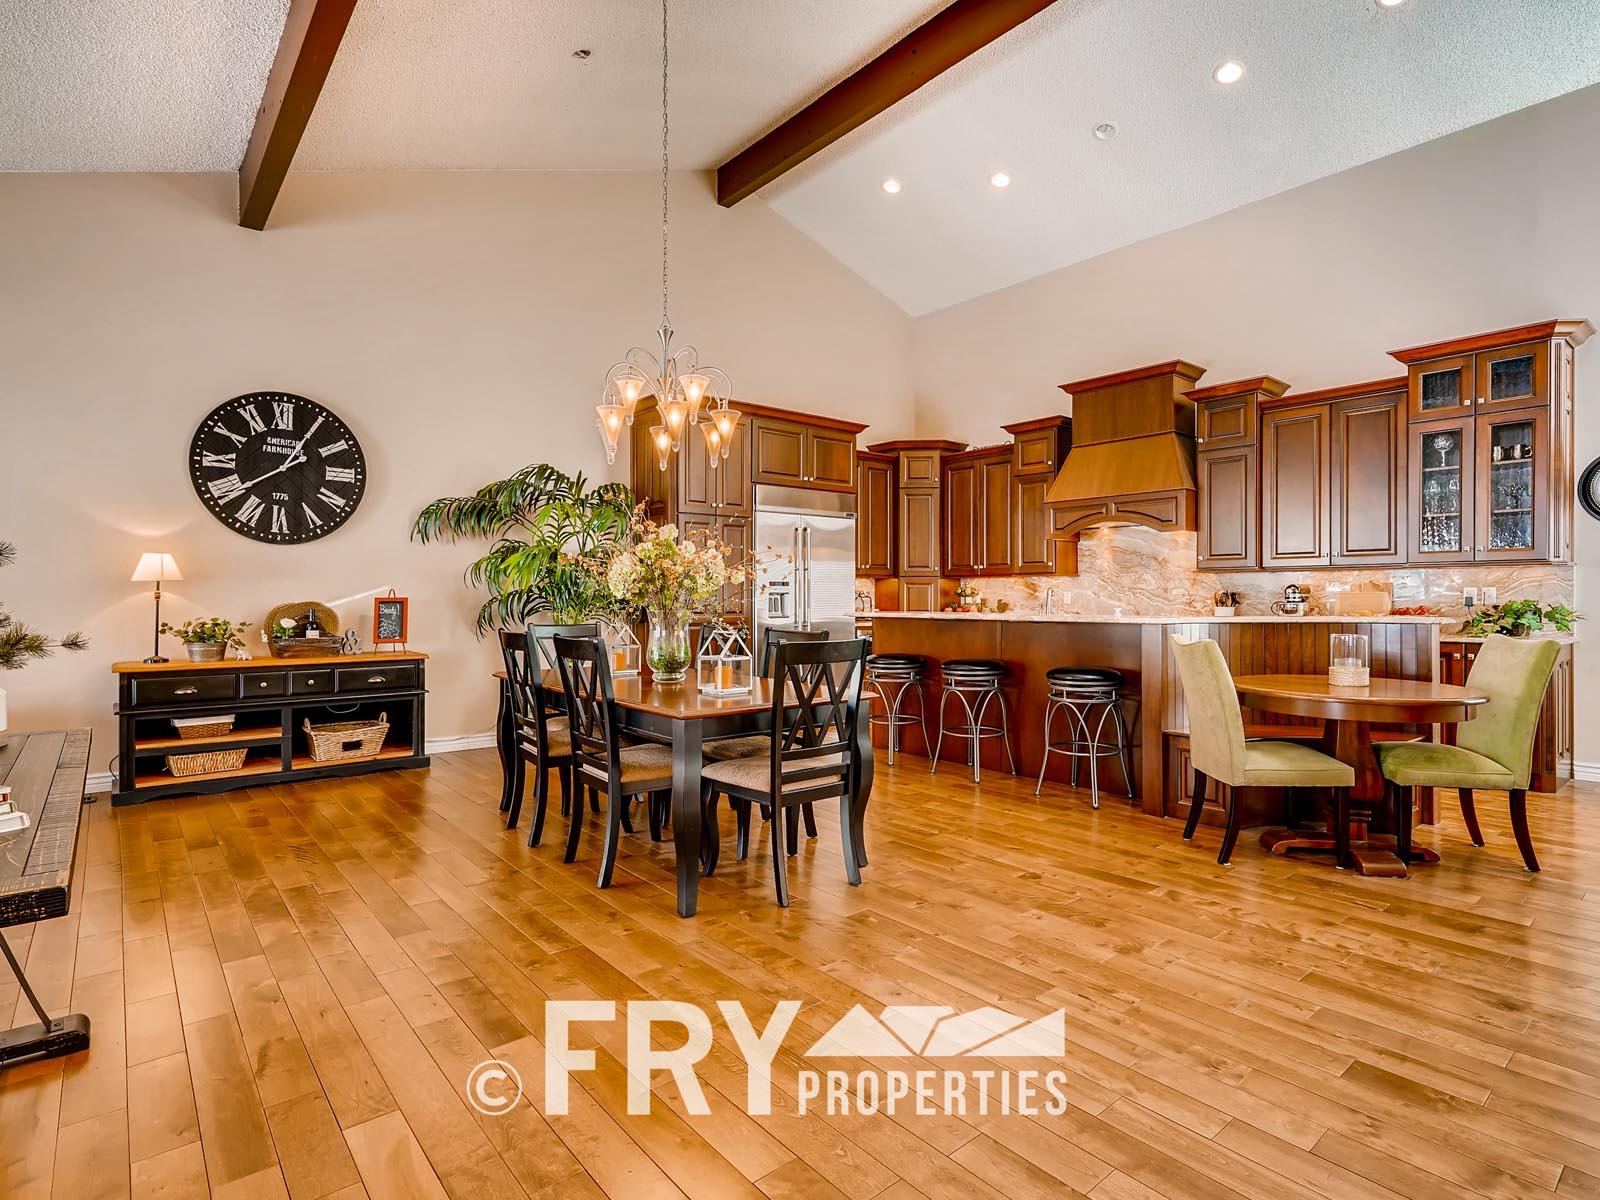 6305 W 6th Ave Unit A6-print-008-5-Dining Room-3600x2400-300dpi